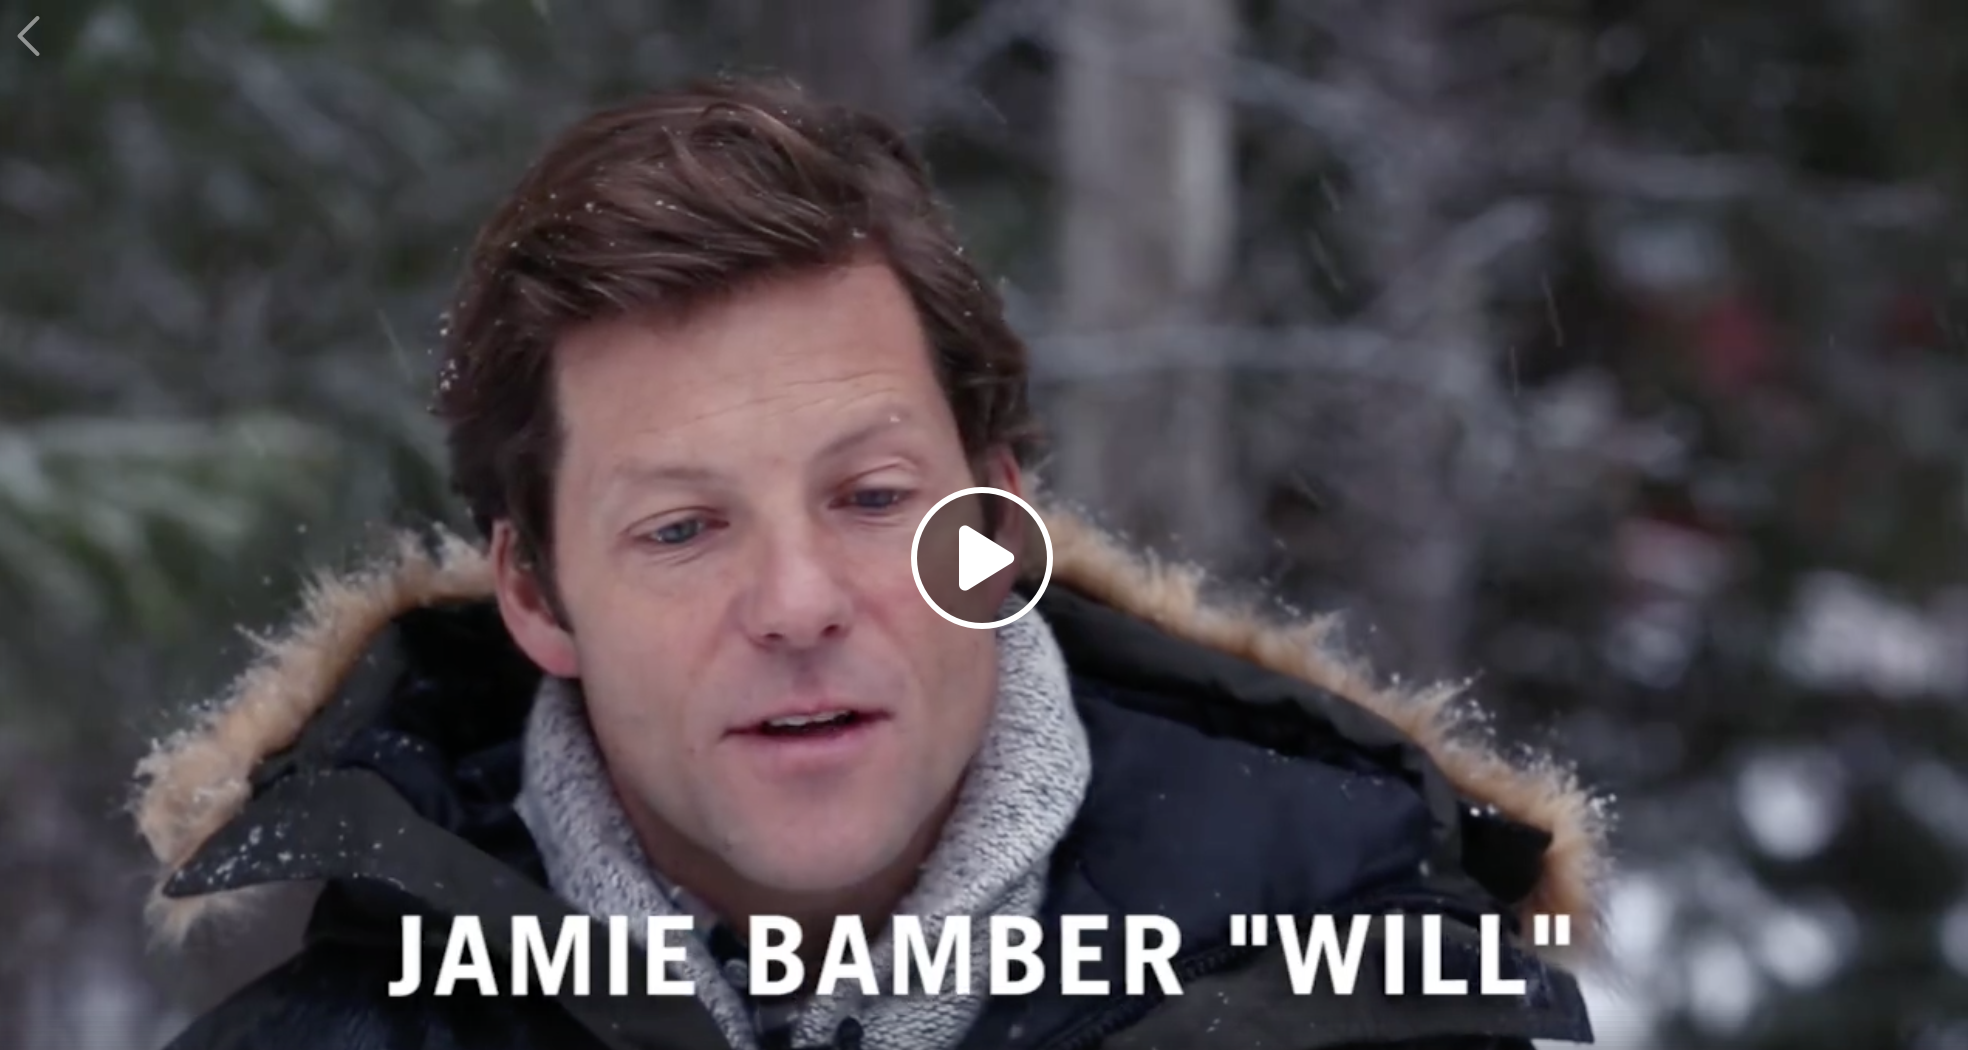 Jamie Bamber BTS